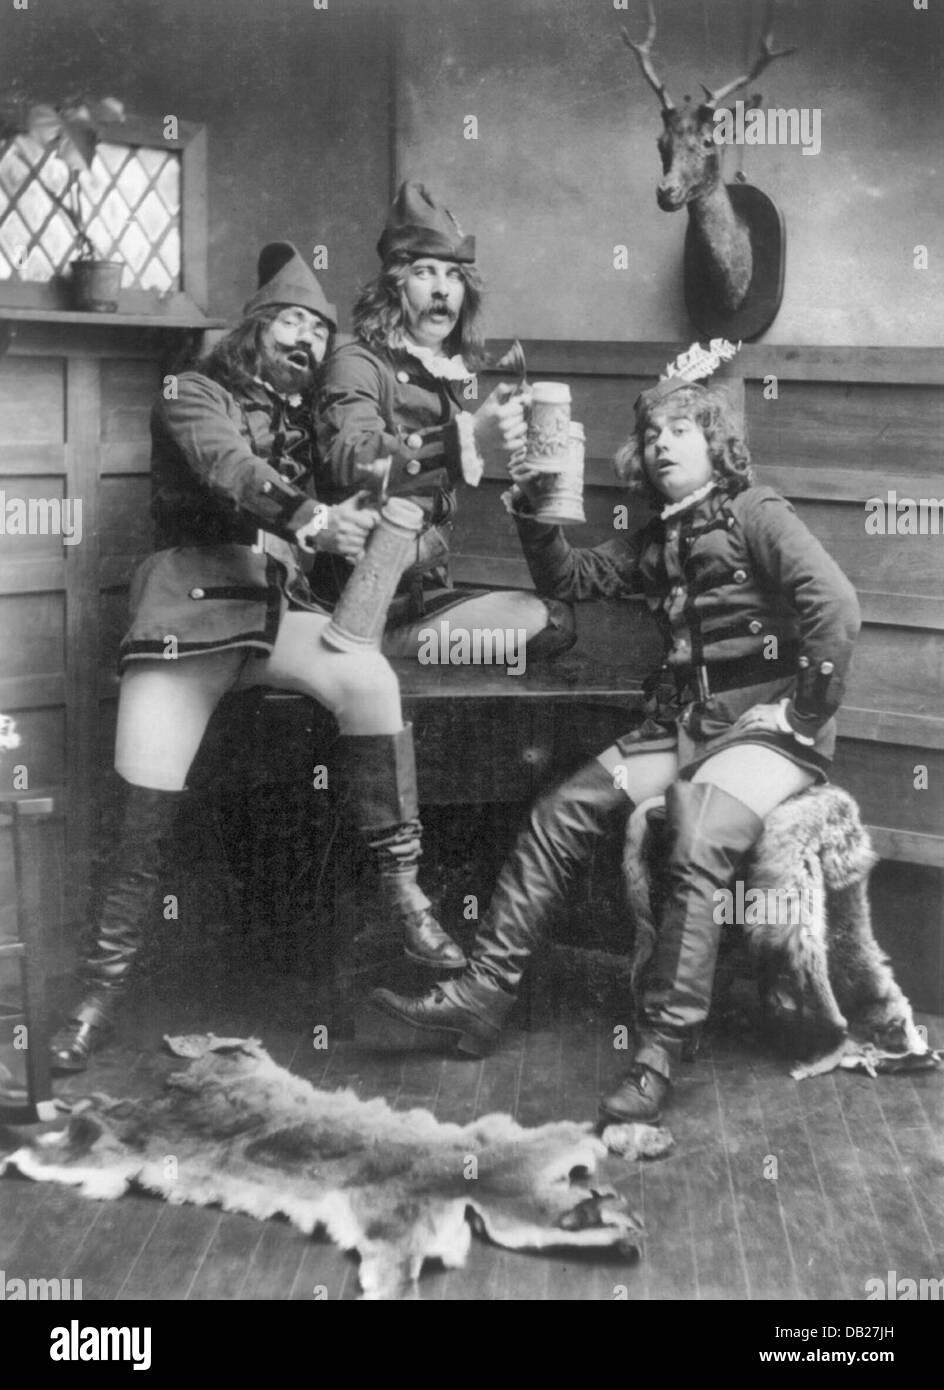 Three men in German student uniforms lifting beer steins, circa 1904 - Stock Image